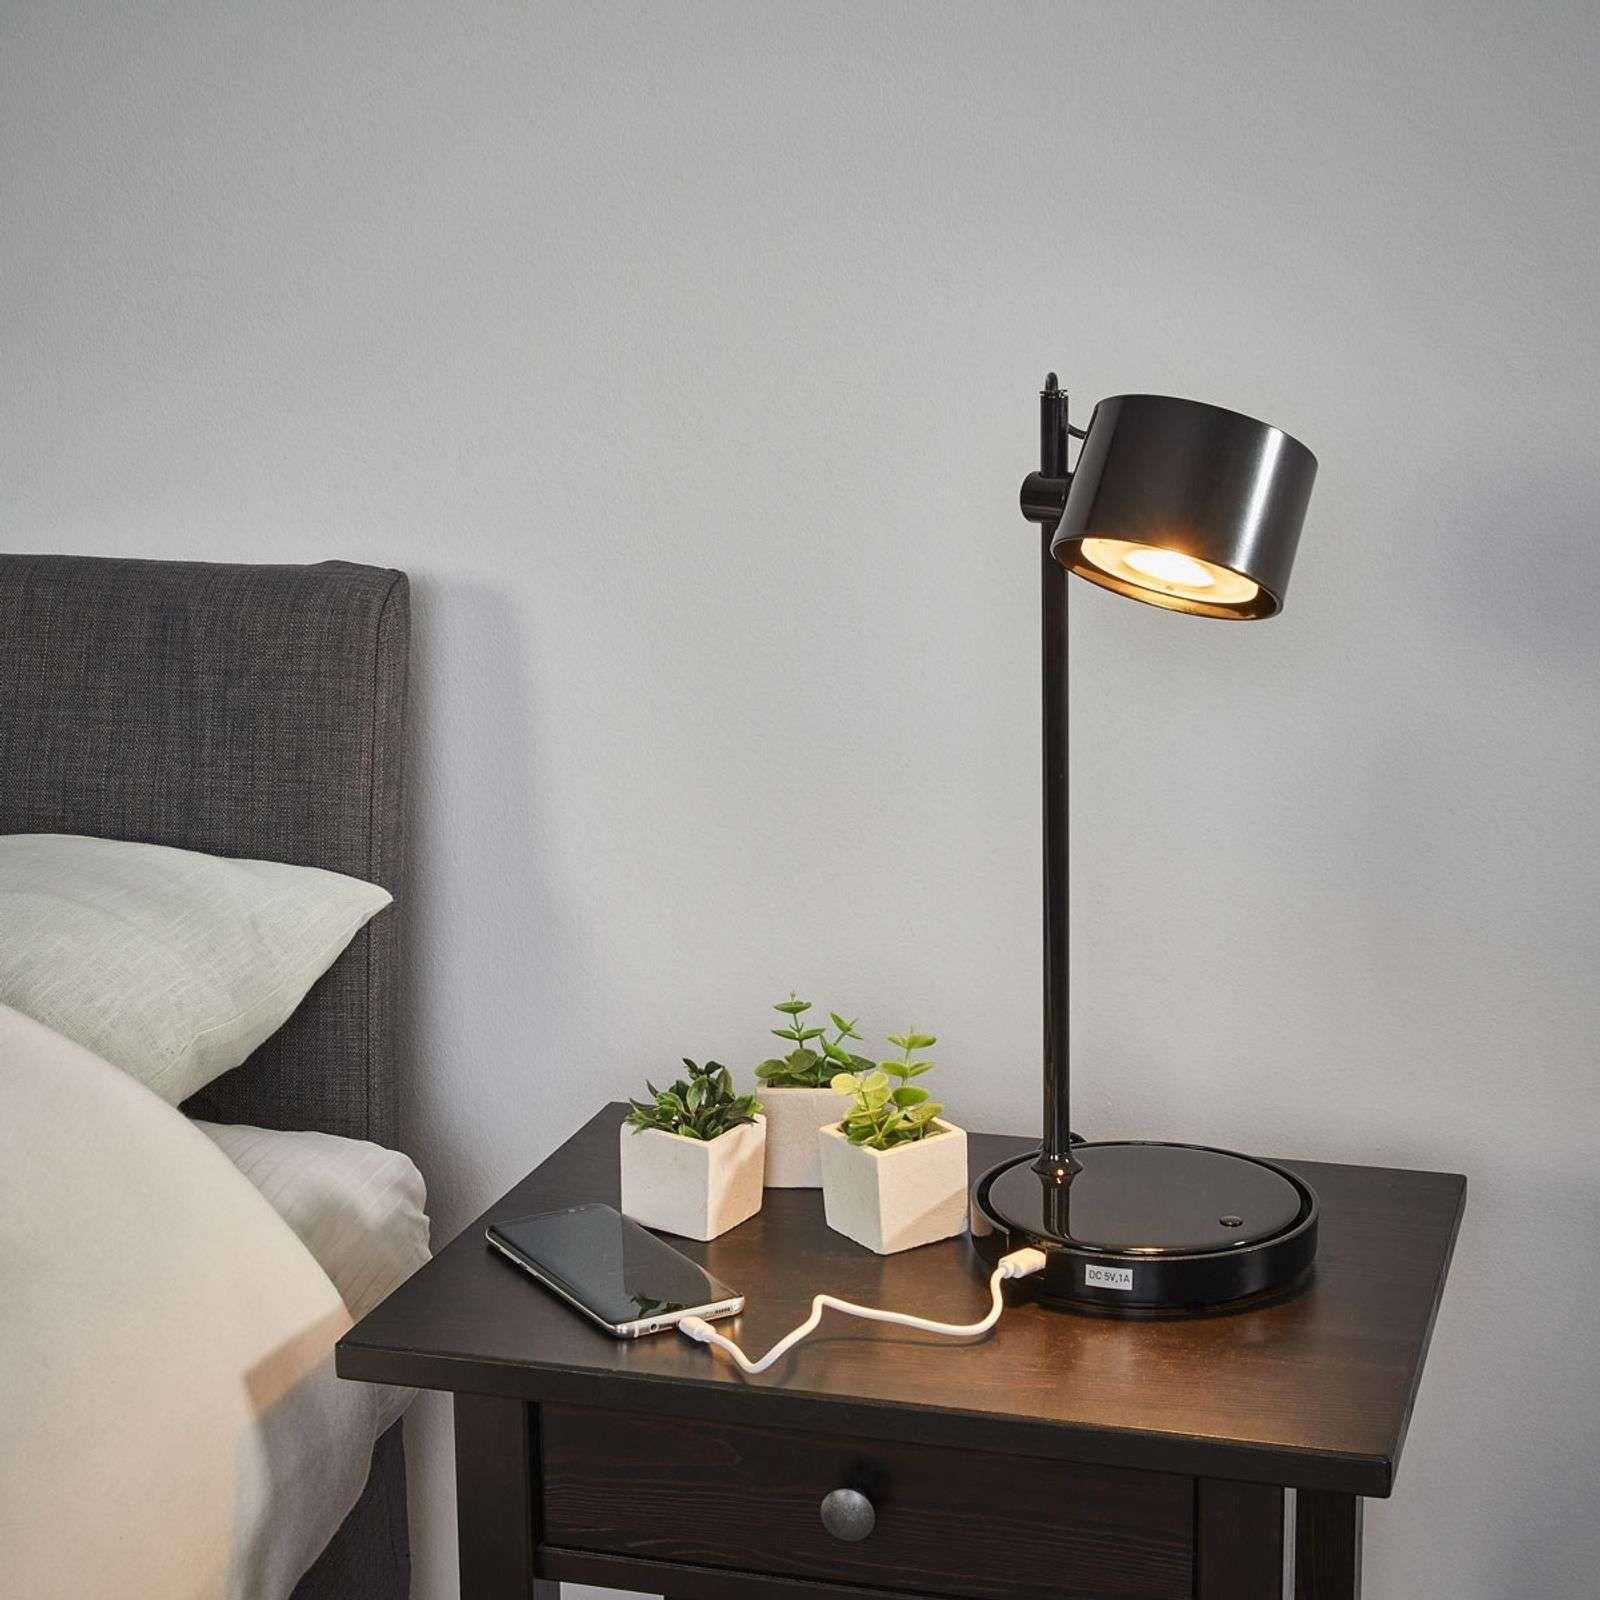 Lampe A Poser Led Idual Jasmine Avec Telecommande De Idual Lampe A Poser Led Et Jasmin